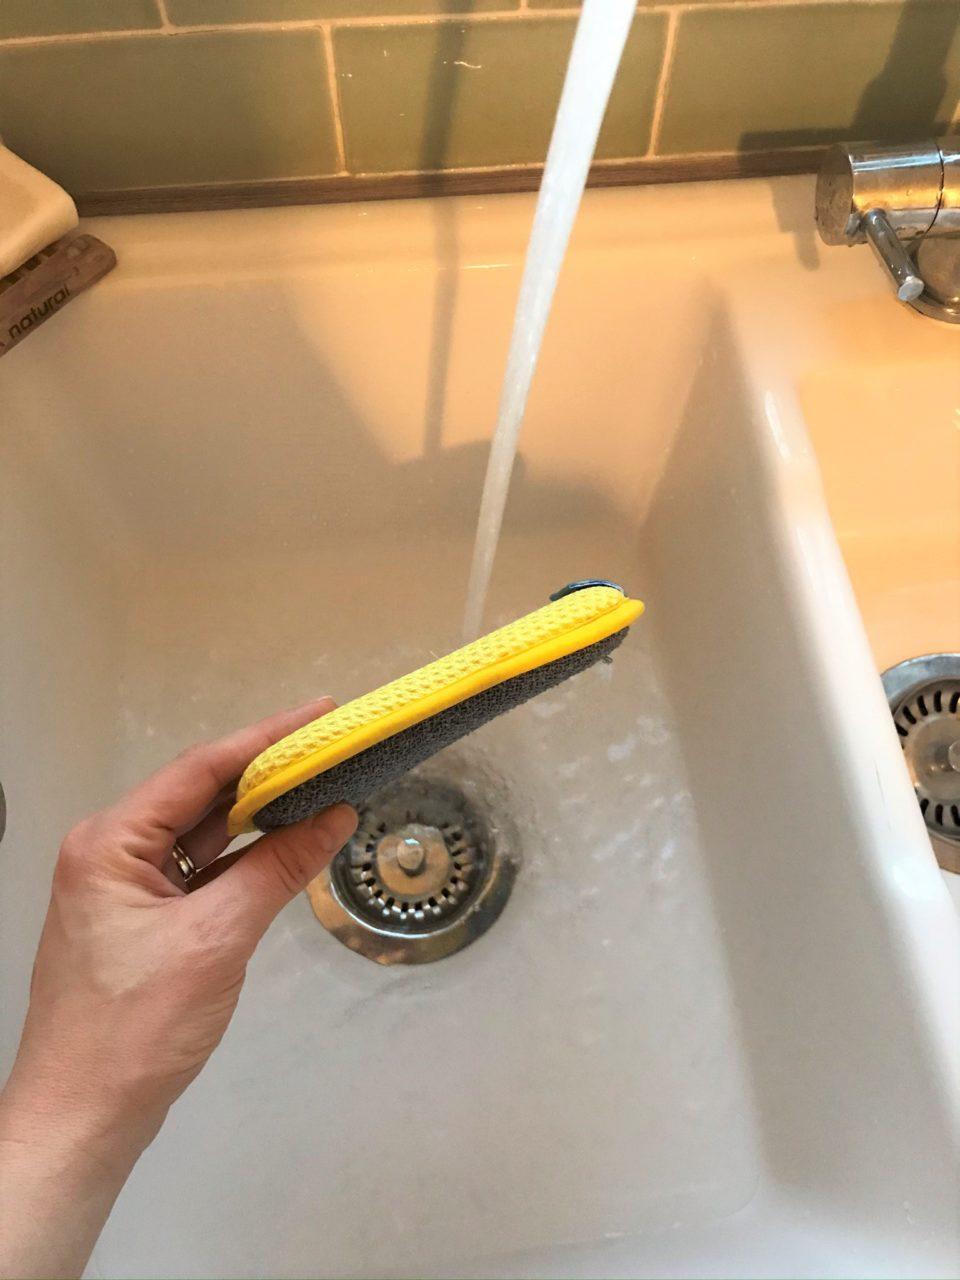 the washing up pad